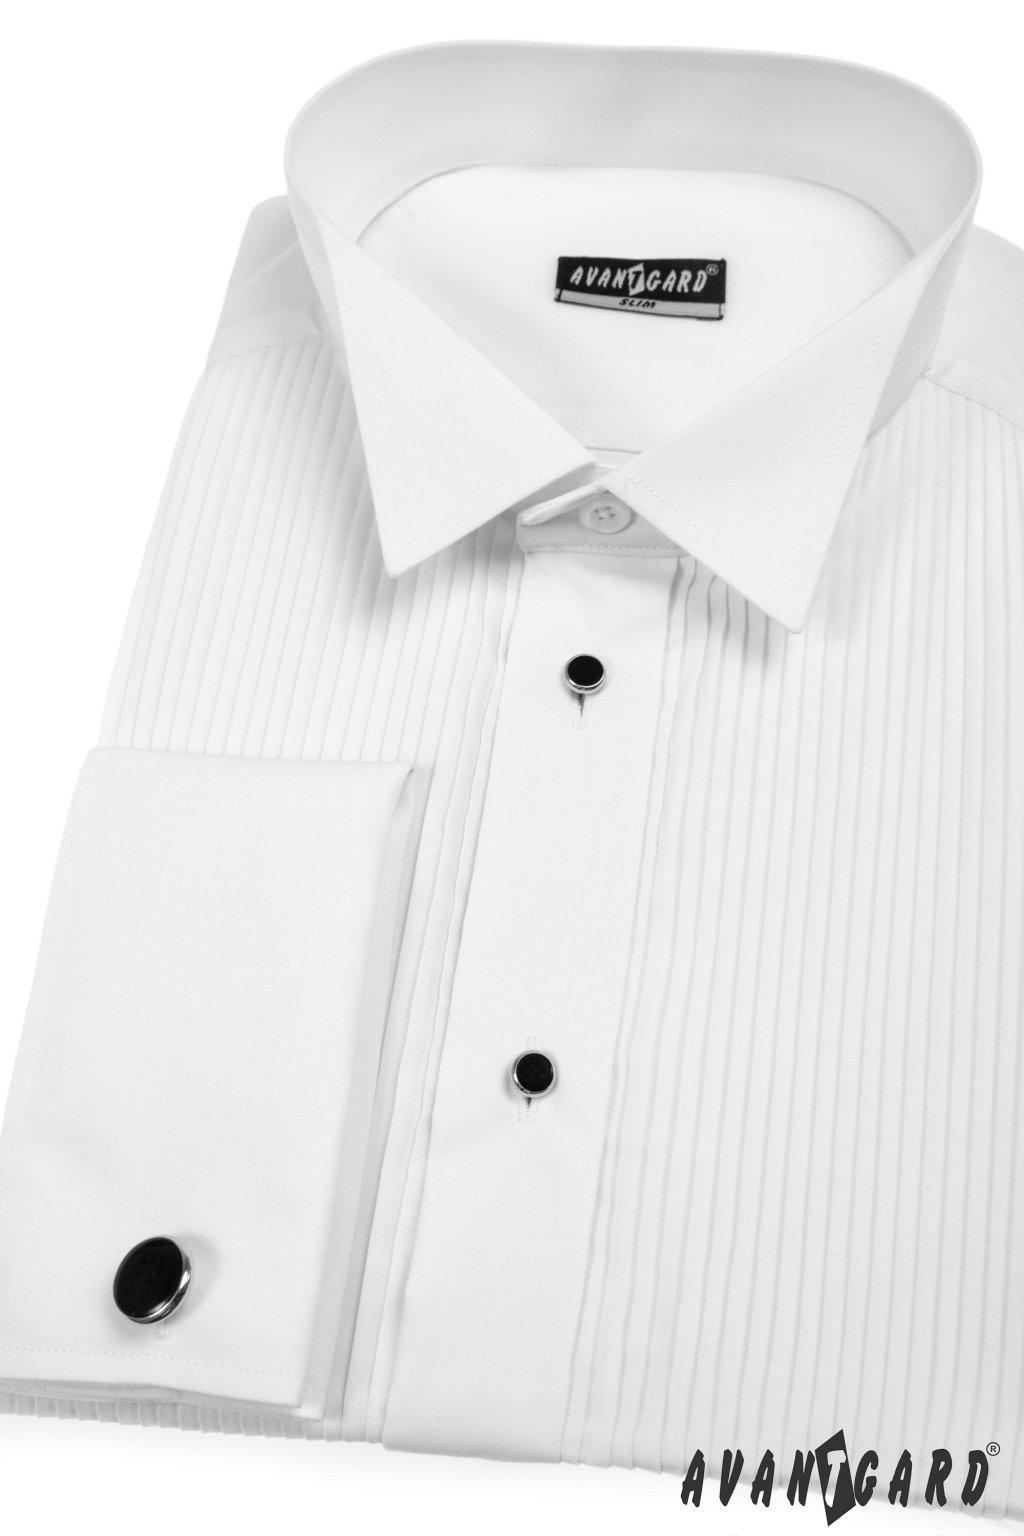 Pánská košile FRAKOVKA SLIM MK se sadou knoflíčků bílá 112 - 1